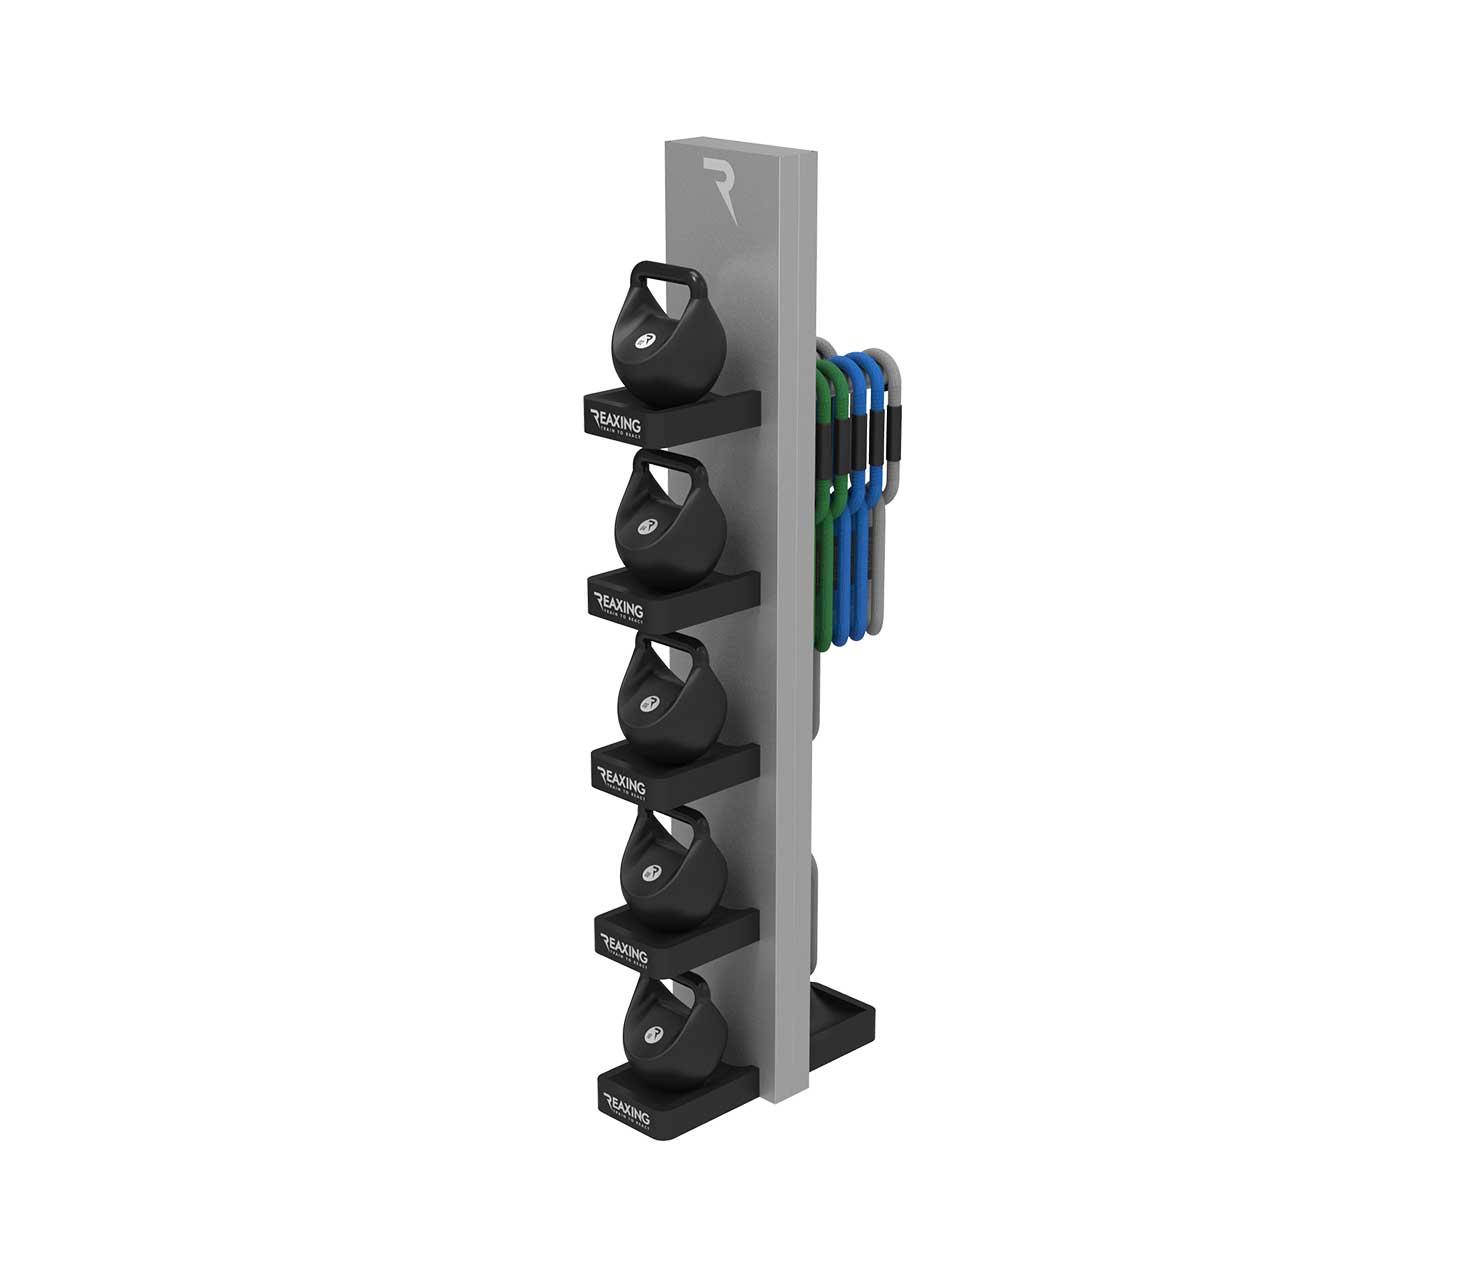 rx1405-reax-combo-vertical-storage-congig-3